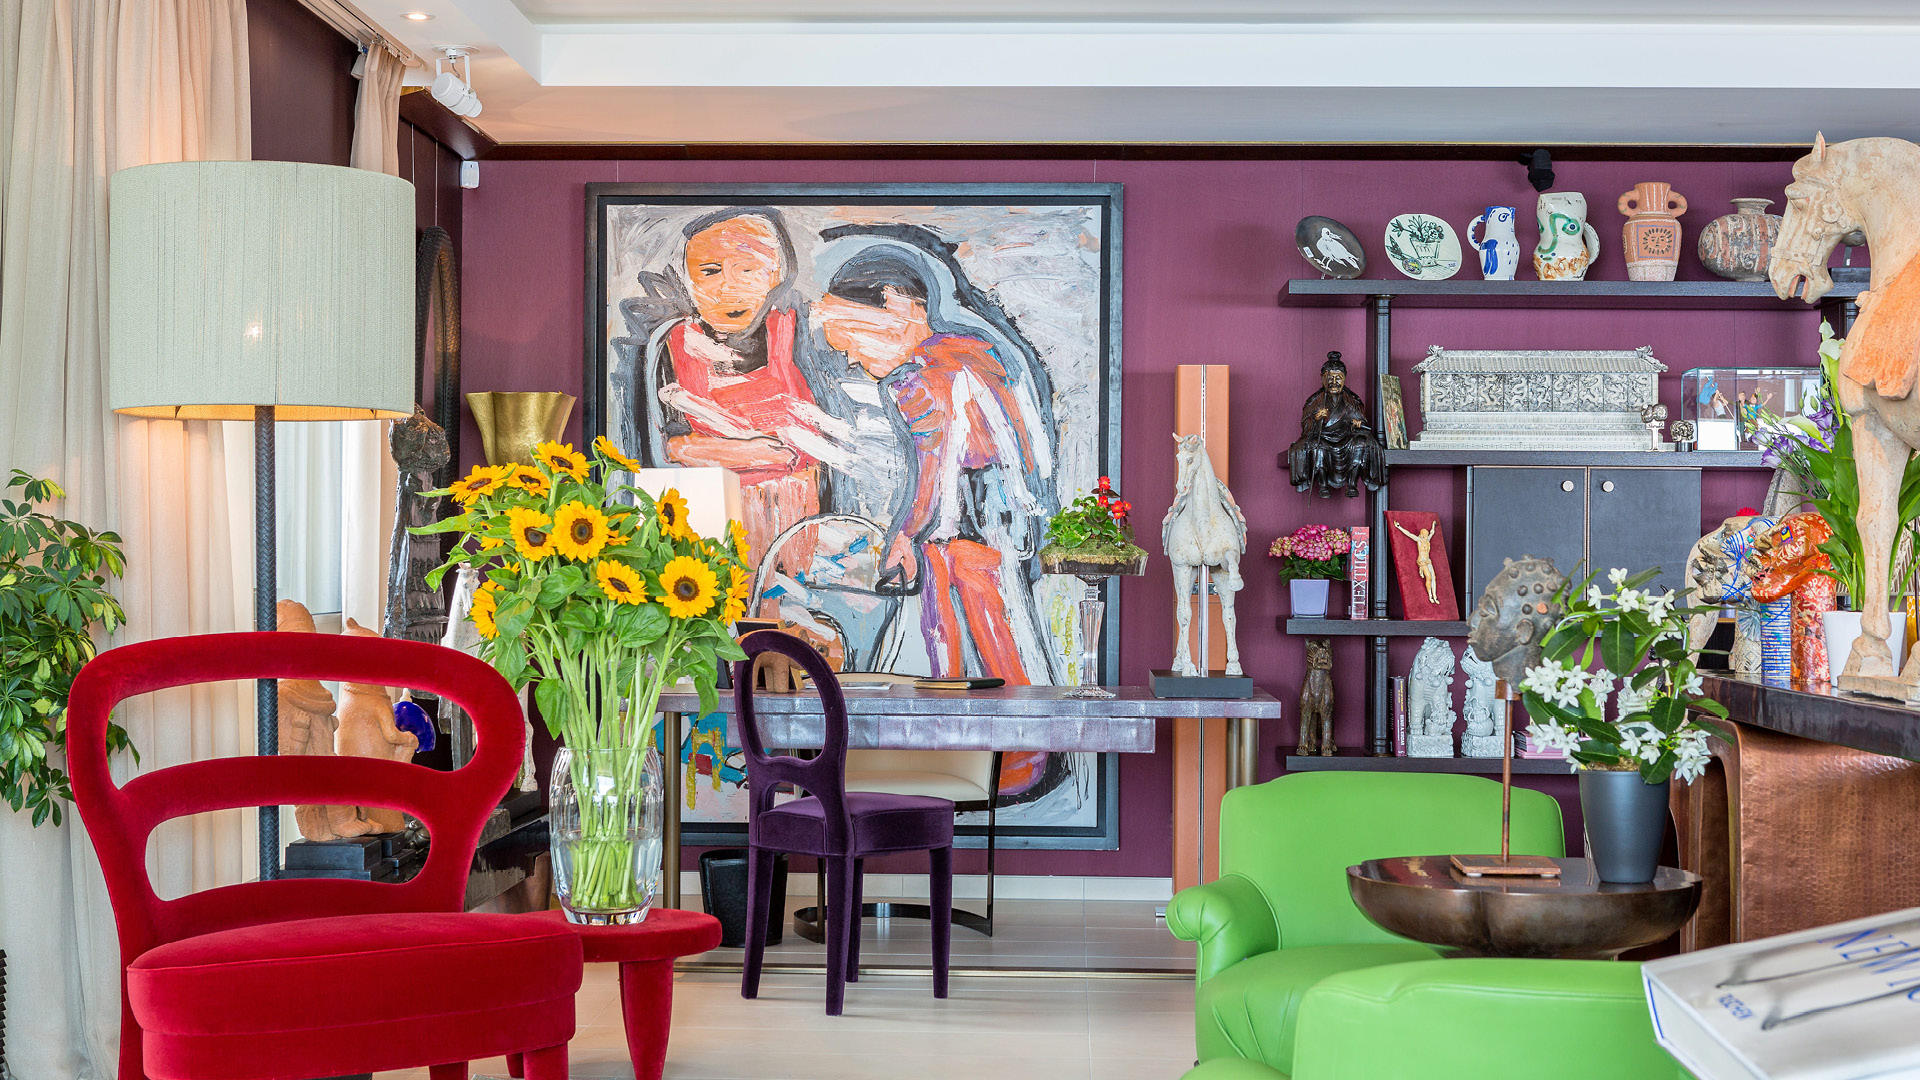 Inside Interior Designer Alia El Tanani's Stunning Family Home In Monaco